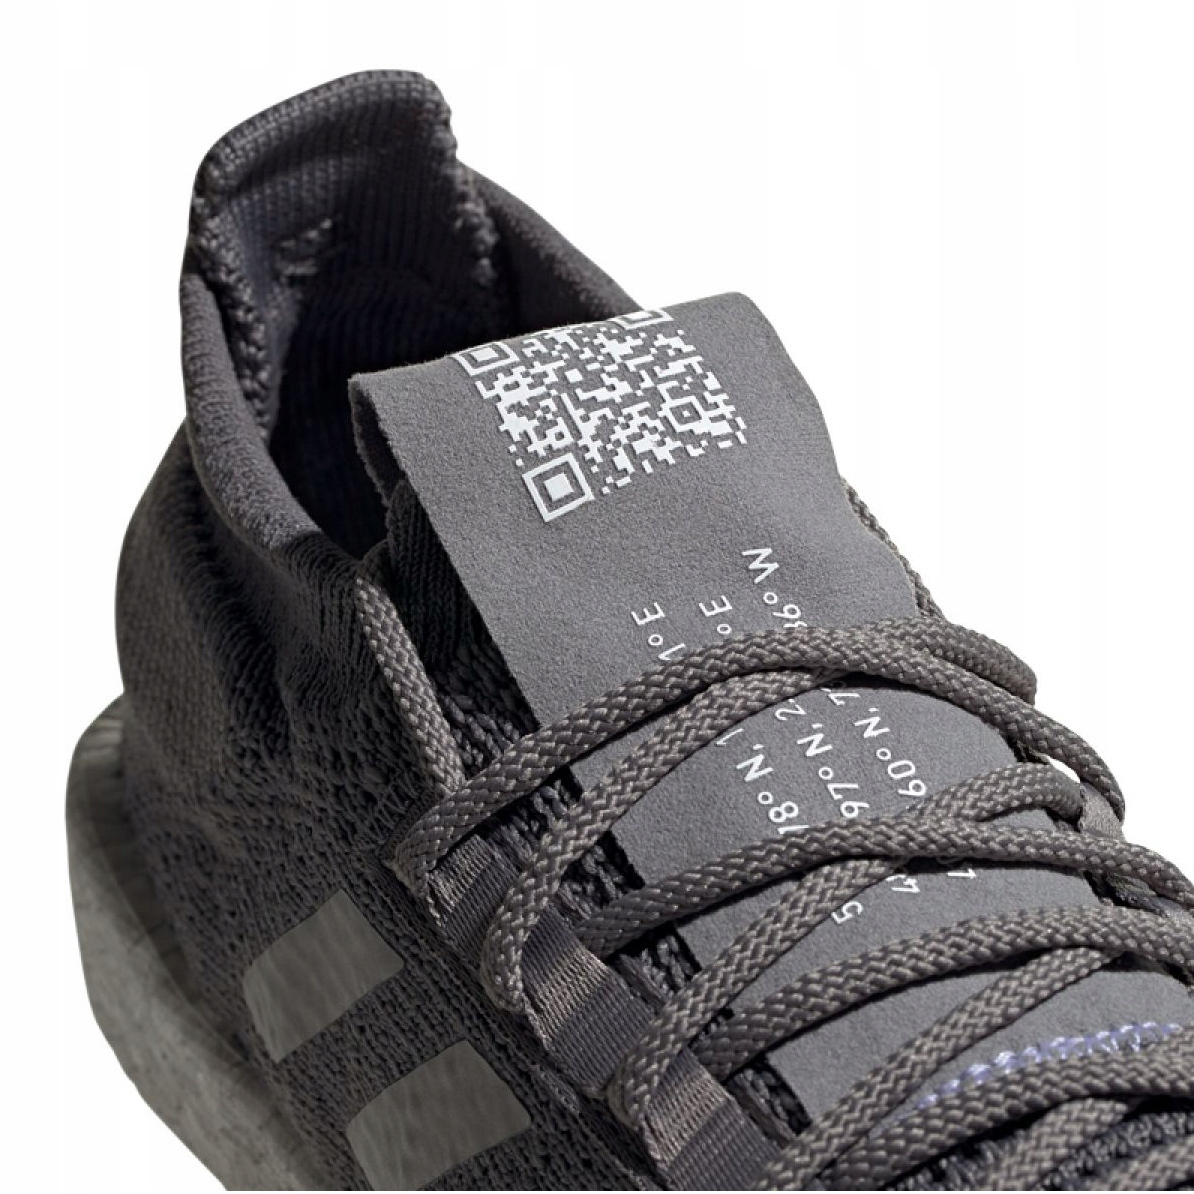 Adidas PulseBOOST Hd M G26932 cipő szürke